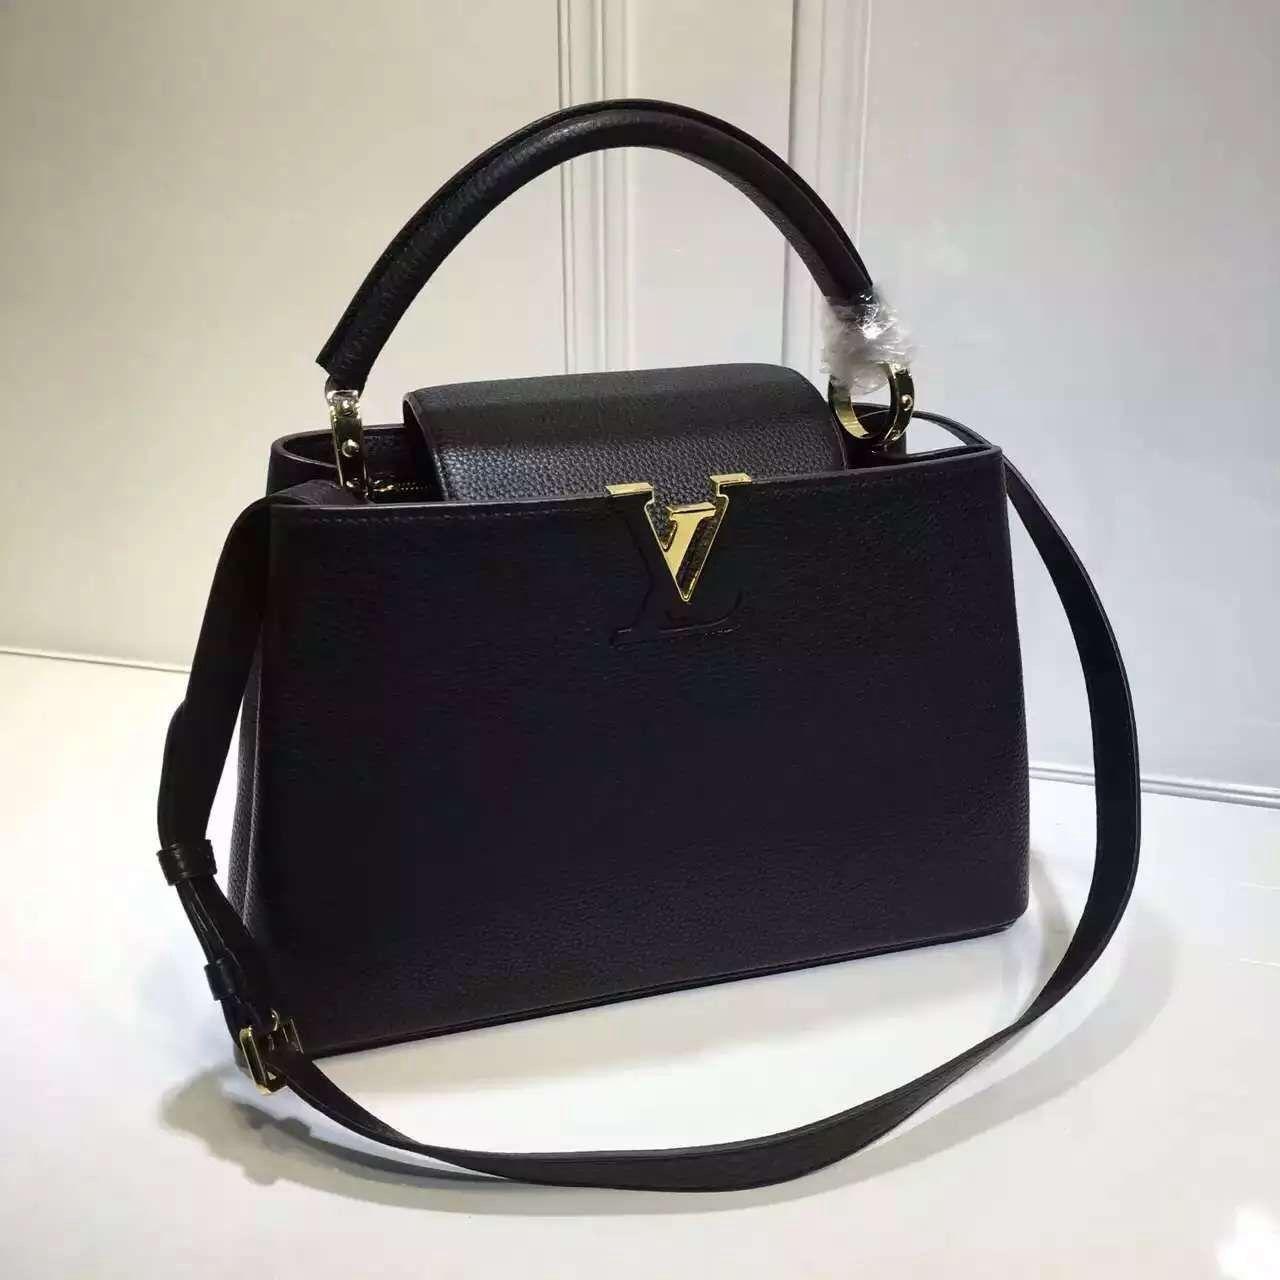 Louis Vuitton Grained Calfskin Multicolor Capucines PM Bag Black (Gold  Hardware) a876adcb2f